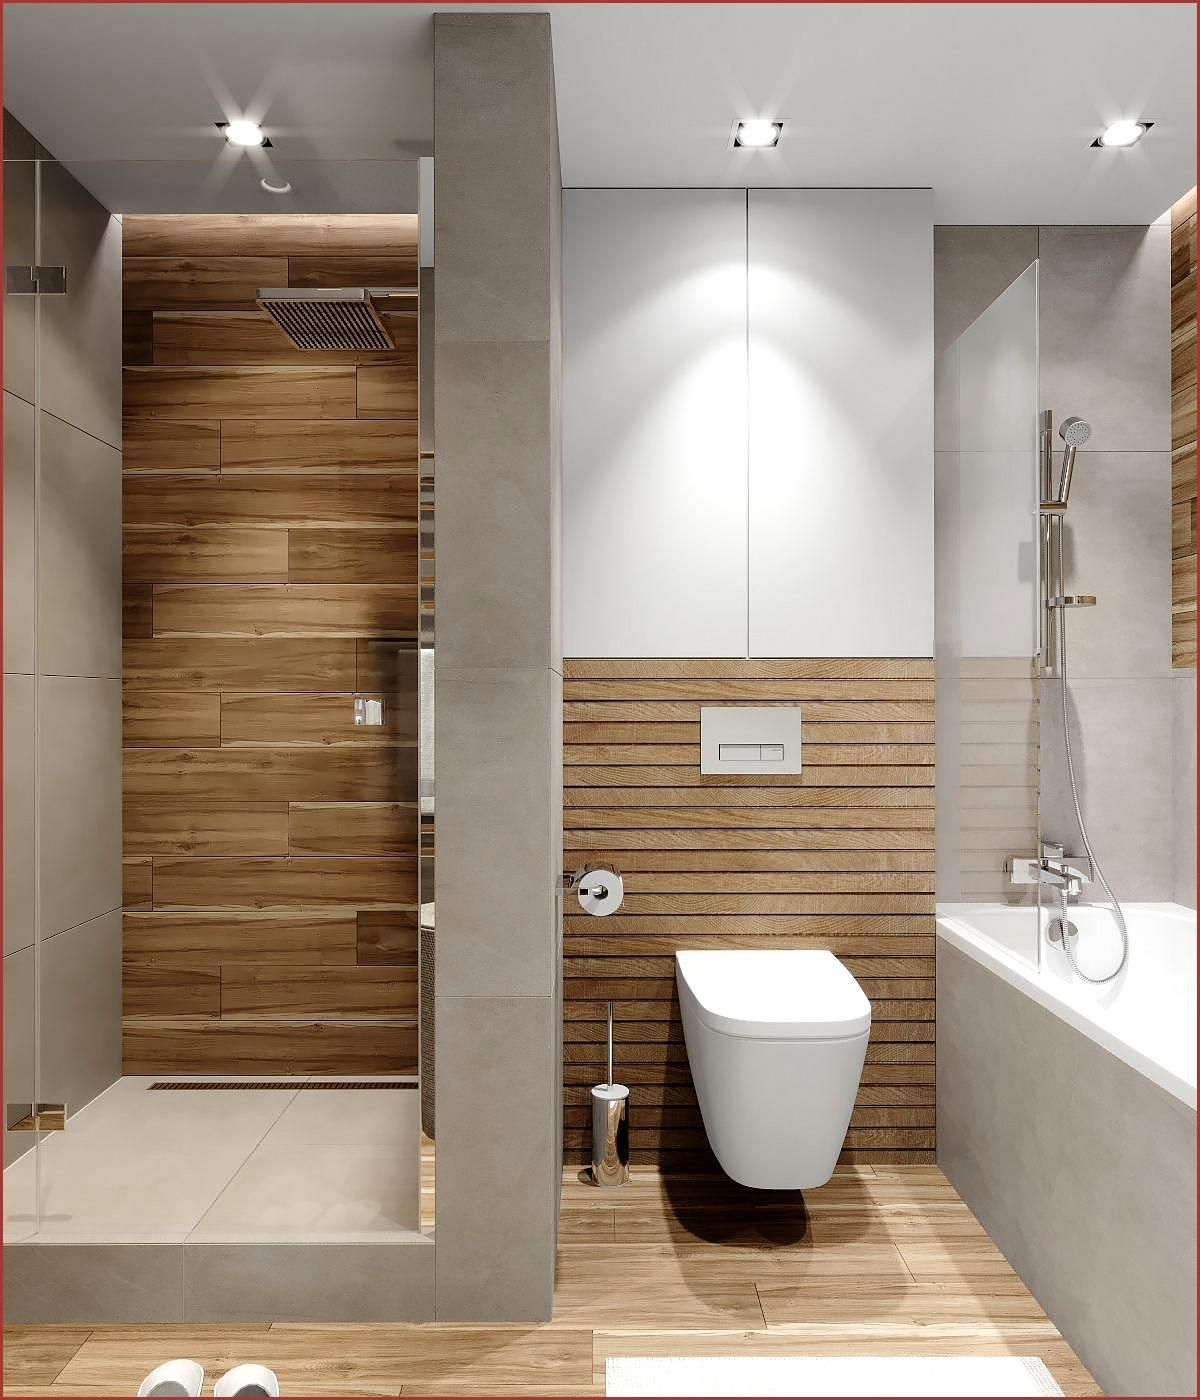 Photo of A + B STUDIO DESIGN moderneBadezimmer #kleineBadezimmer #Badezimmer #Badezimmer …